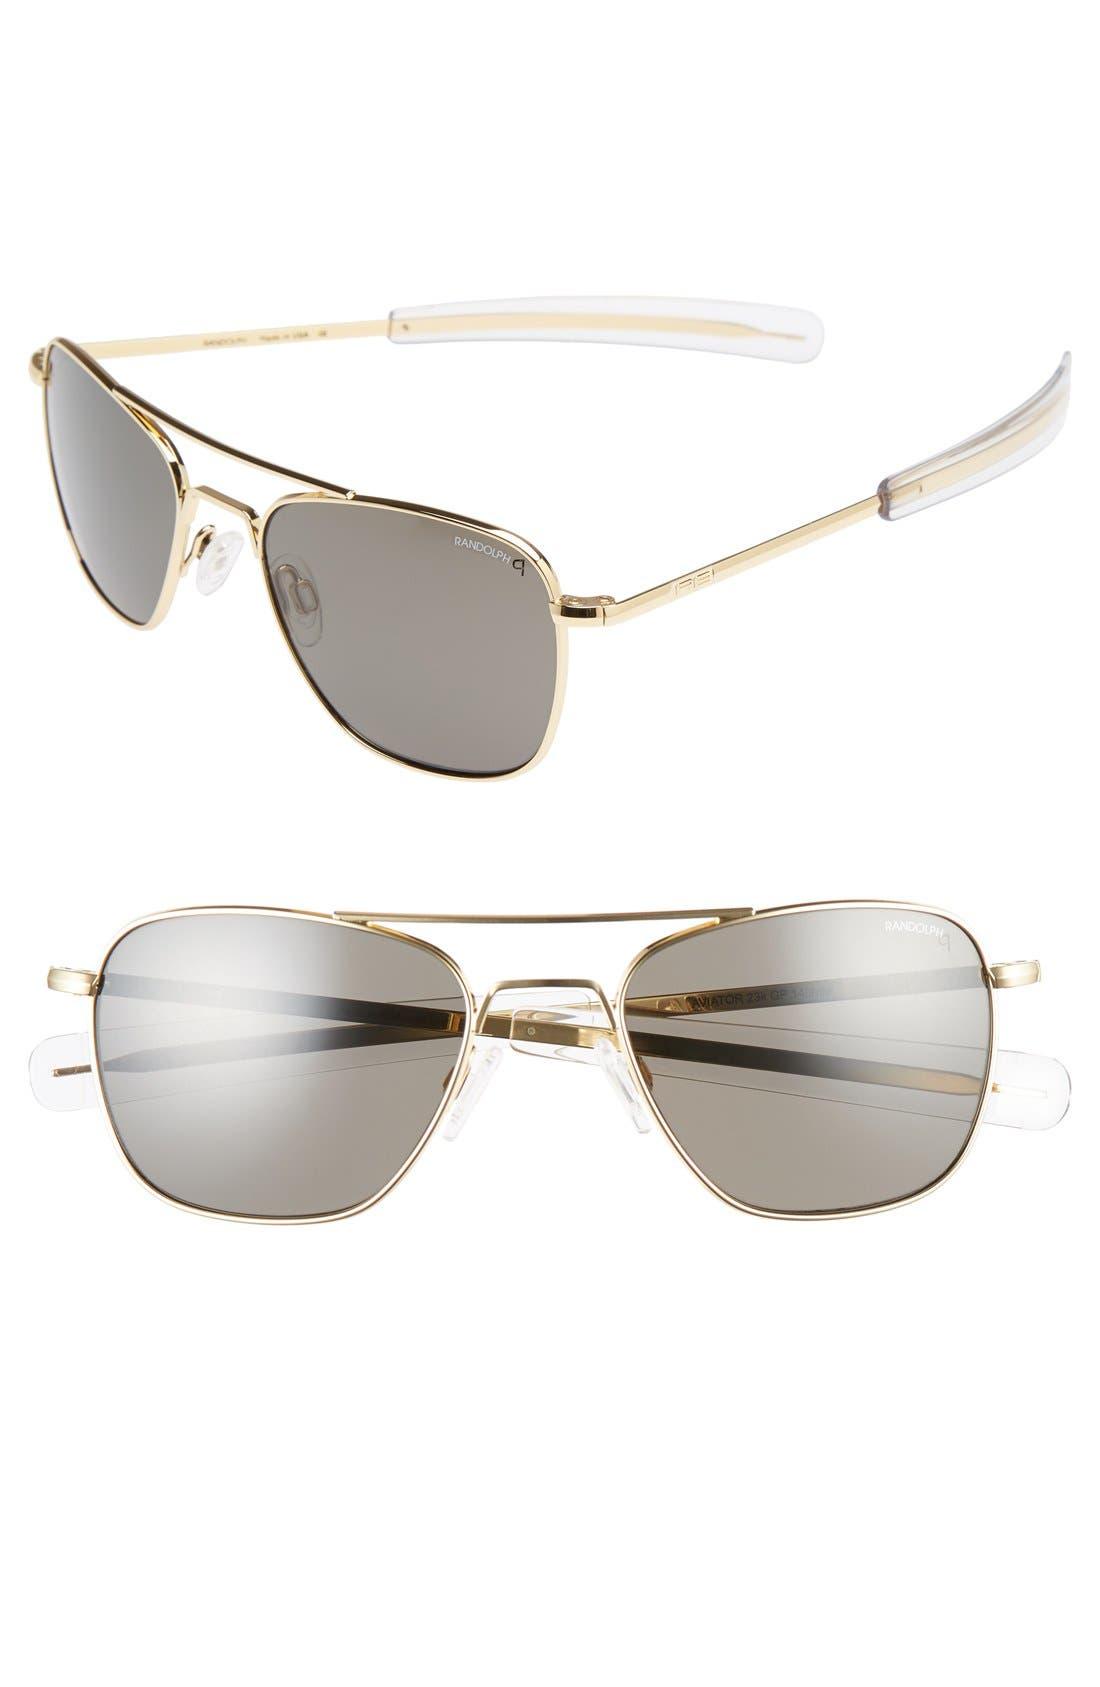 Main Image - Randolph Engineering 52mm Polarized Aviator Sunglasses